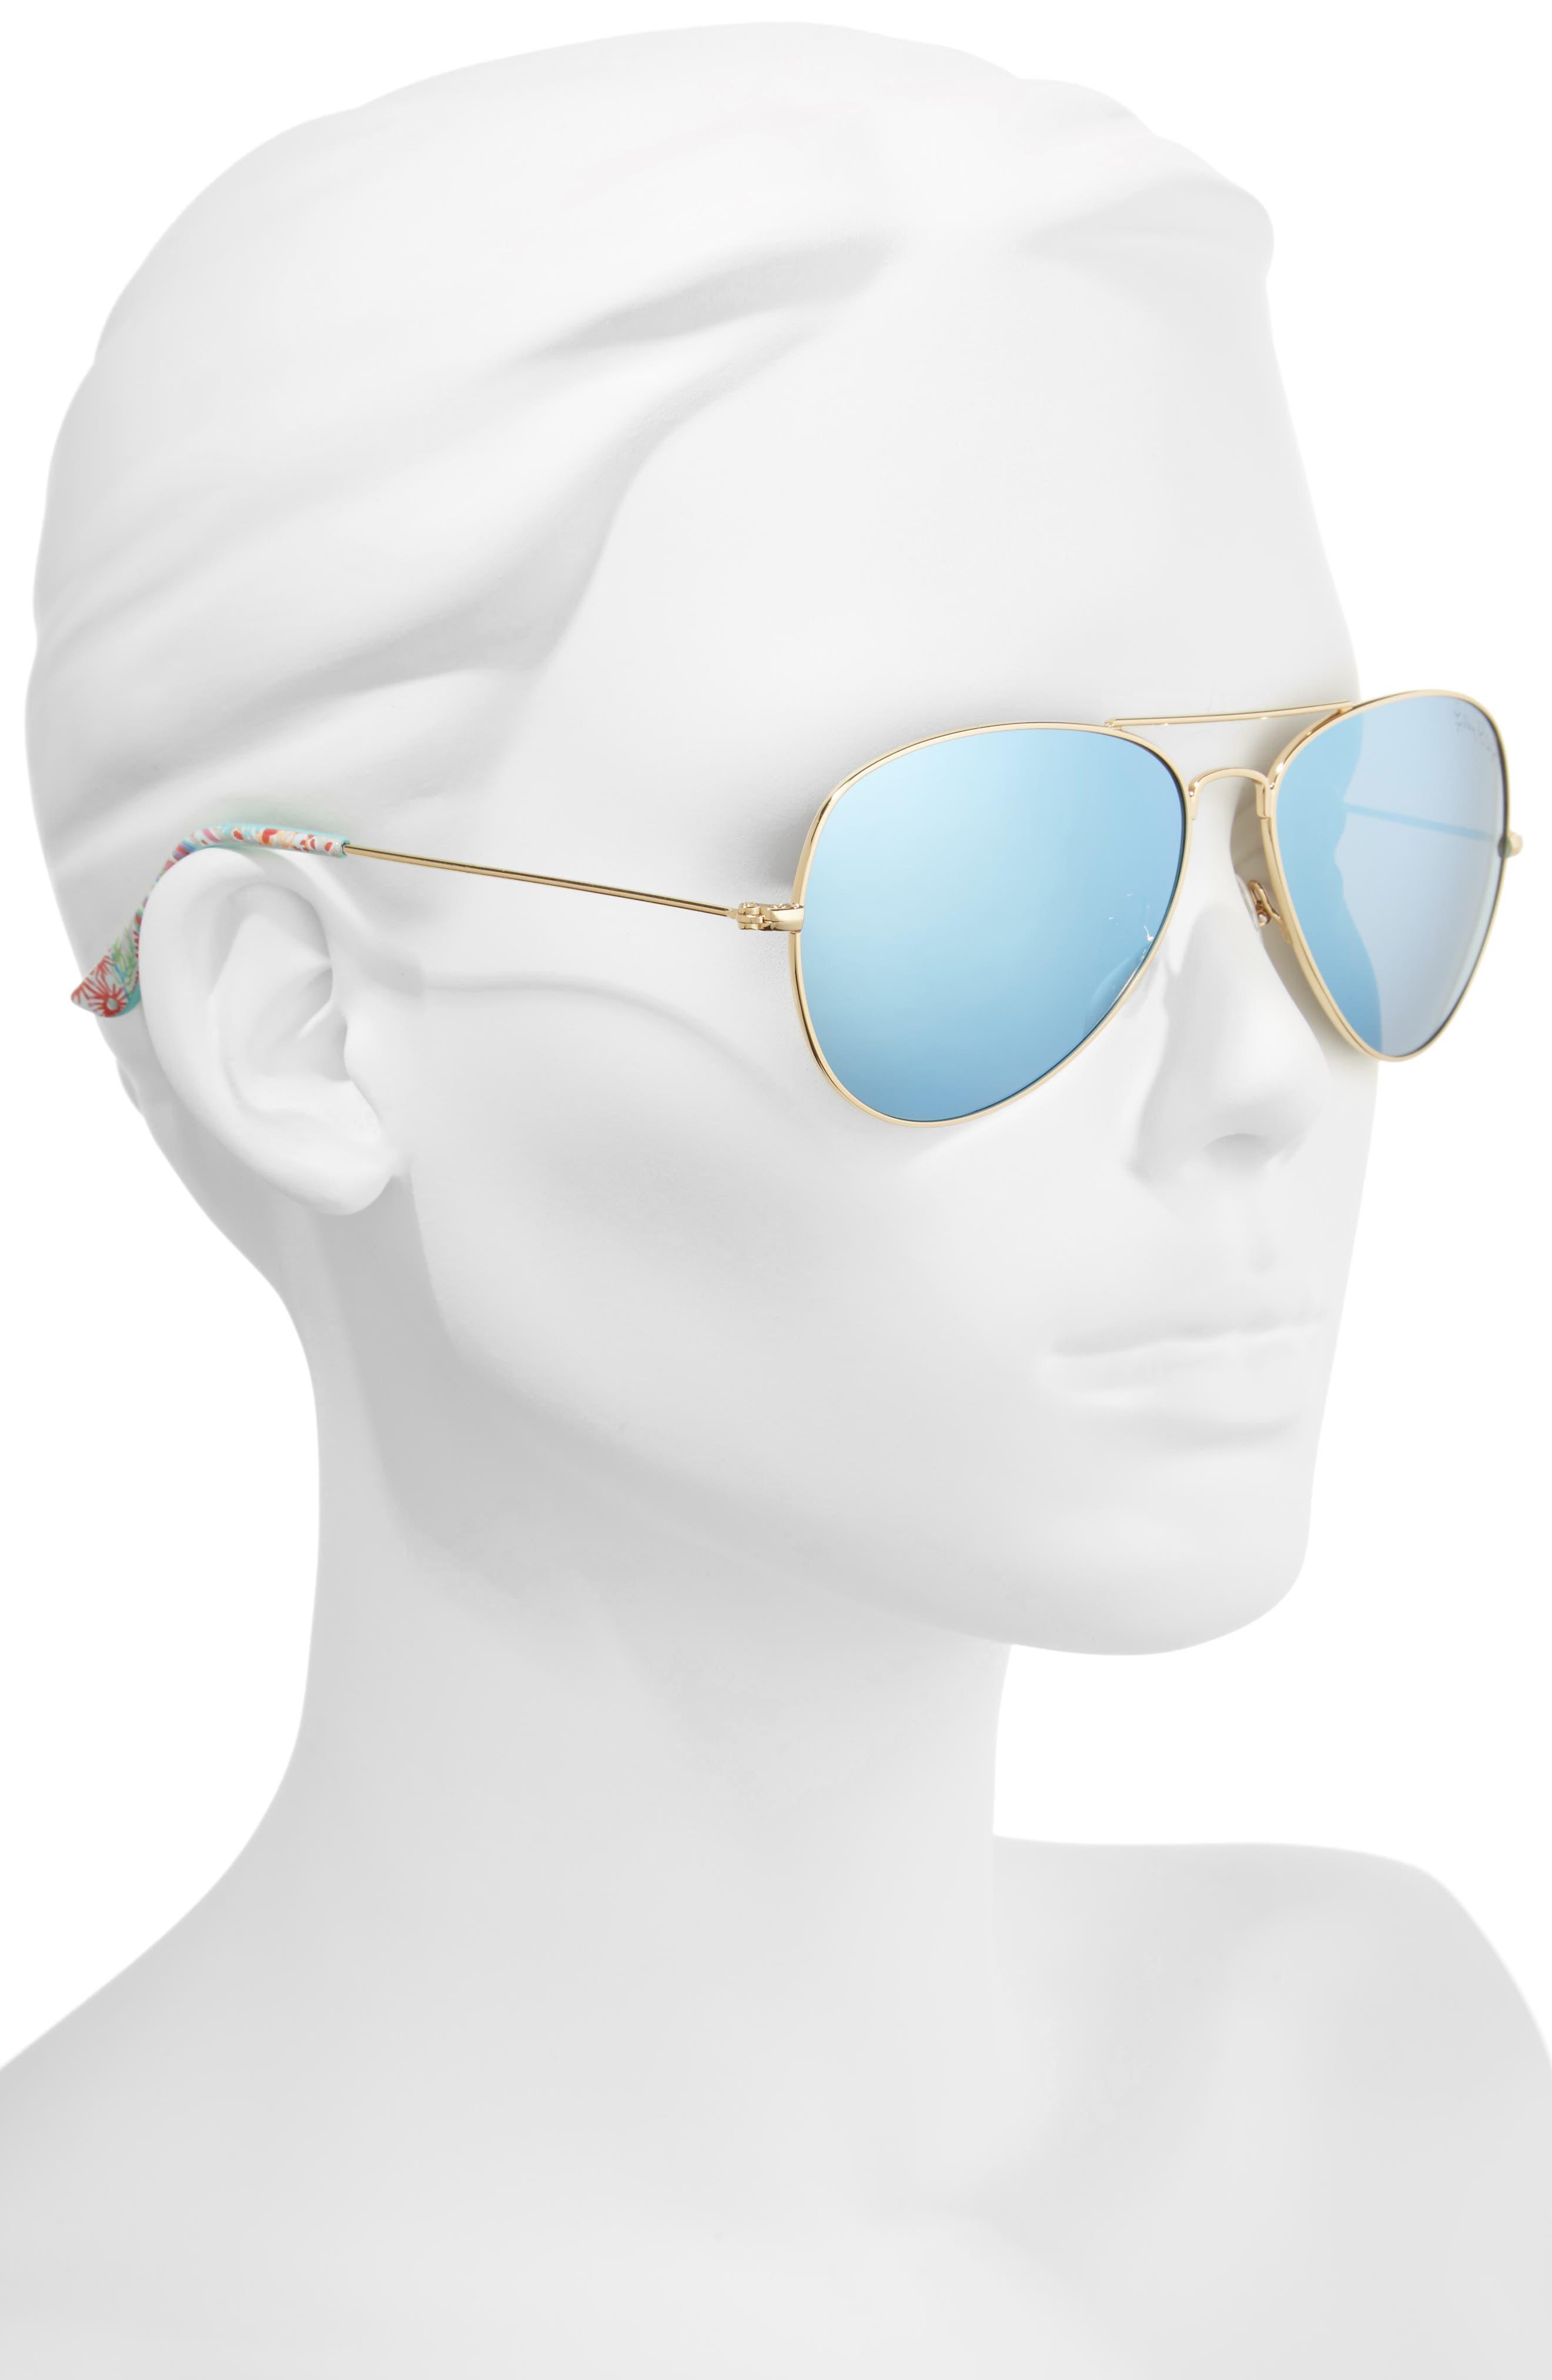 Lexy 59mm Polarized Aviator Sunglasses,                             Alternate thumbnail 2, color,                             BLUE 2